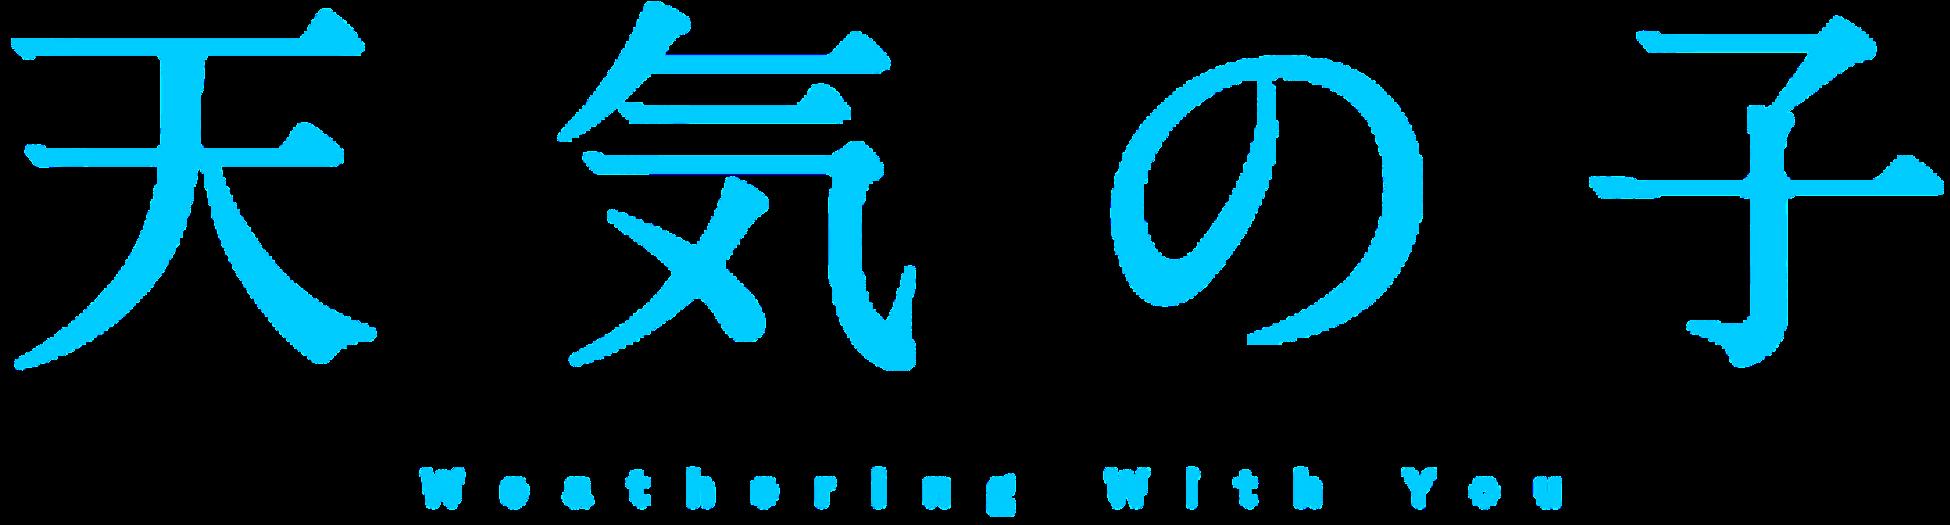 Berkas Weathering With You Movie Wordmark Logo Png Wikipedia Bahasa Indonesia Ensiklopedia Bebas